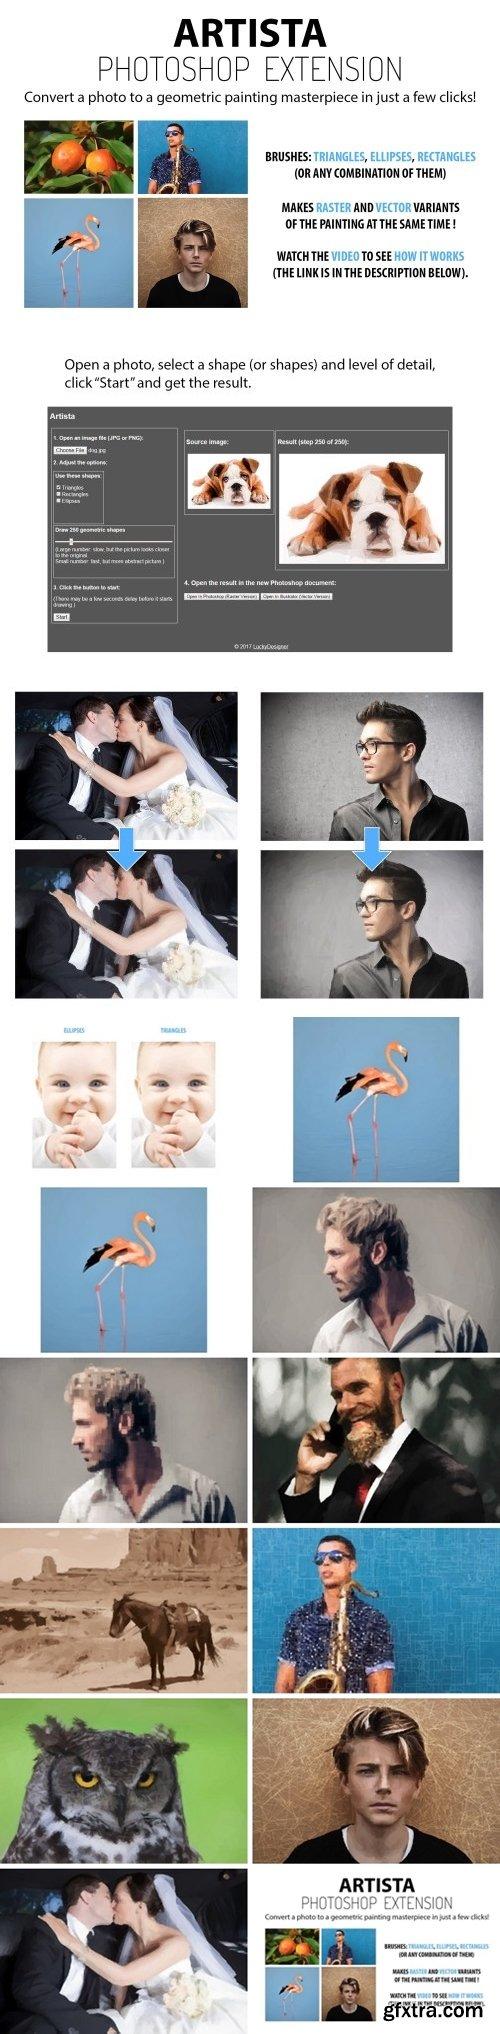 CM - Artista Photoshop Extension 2170939